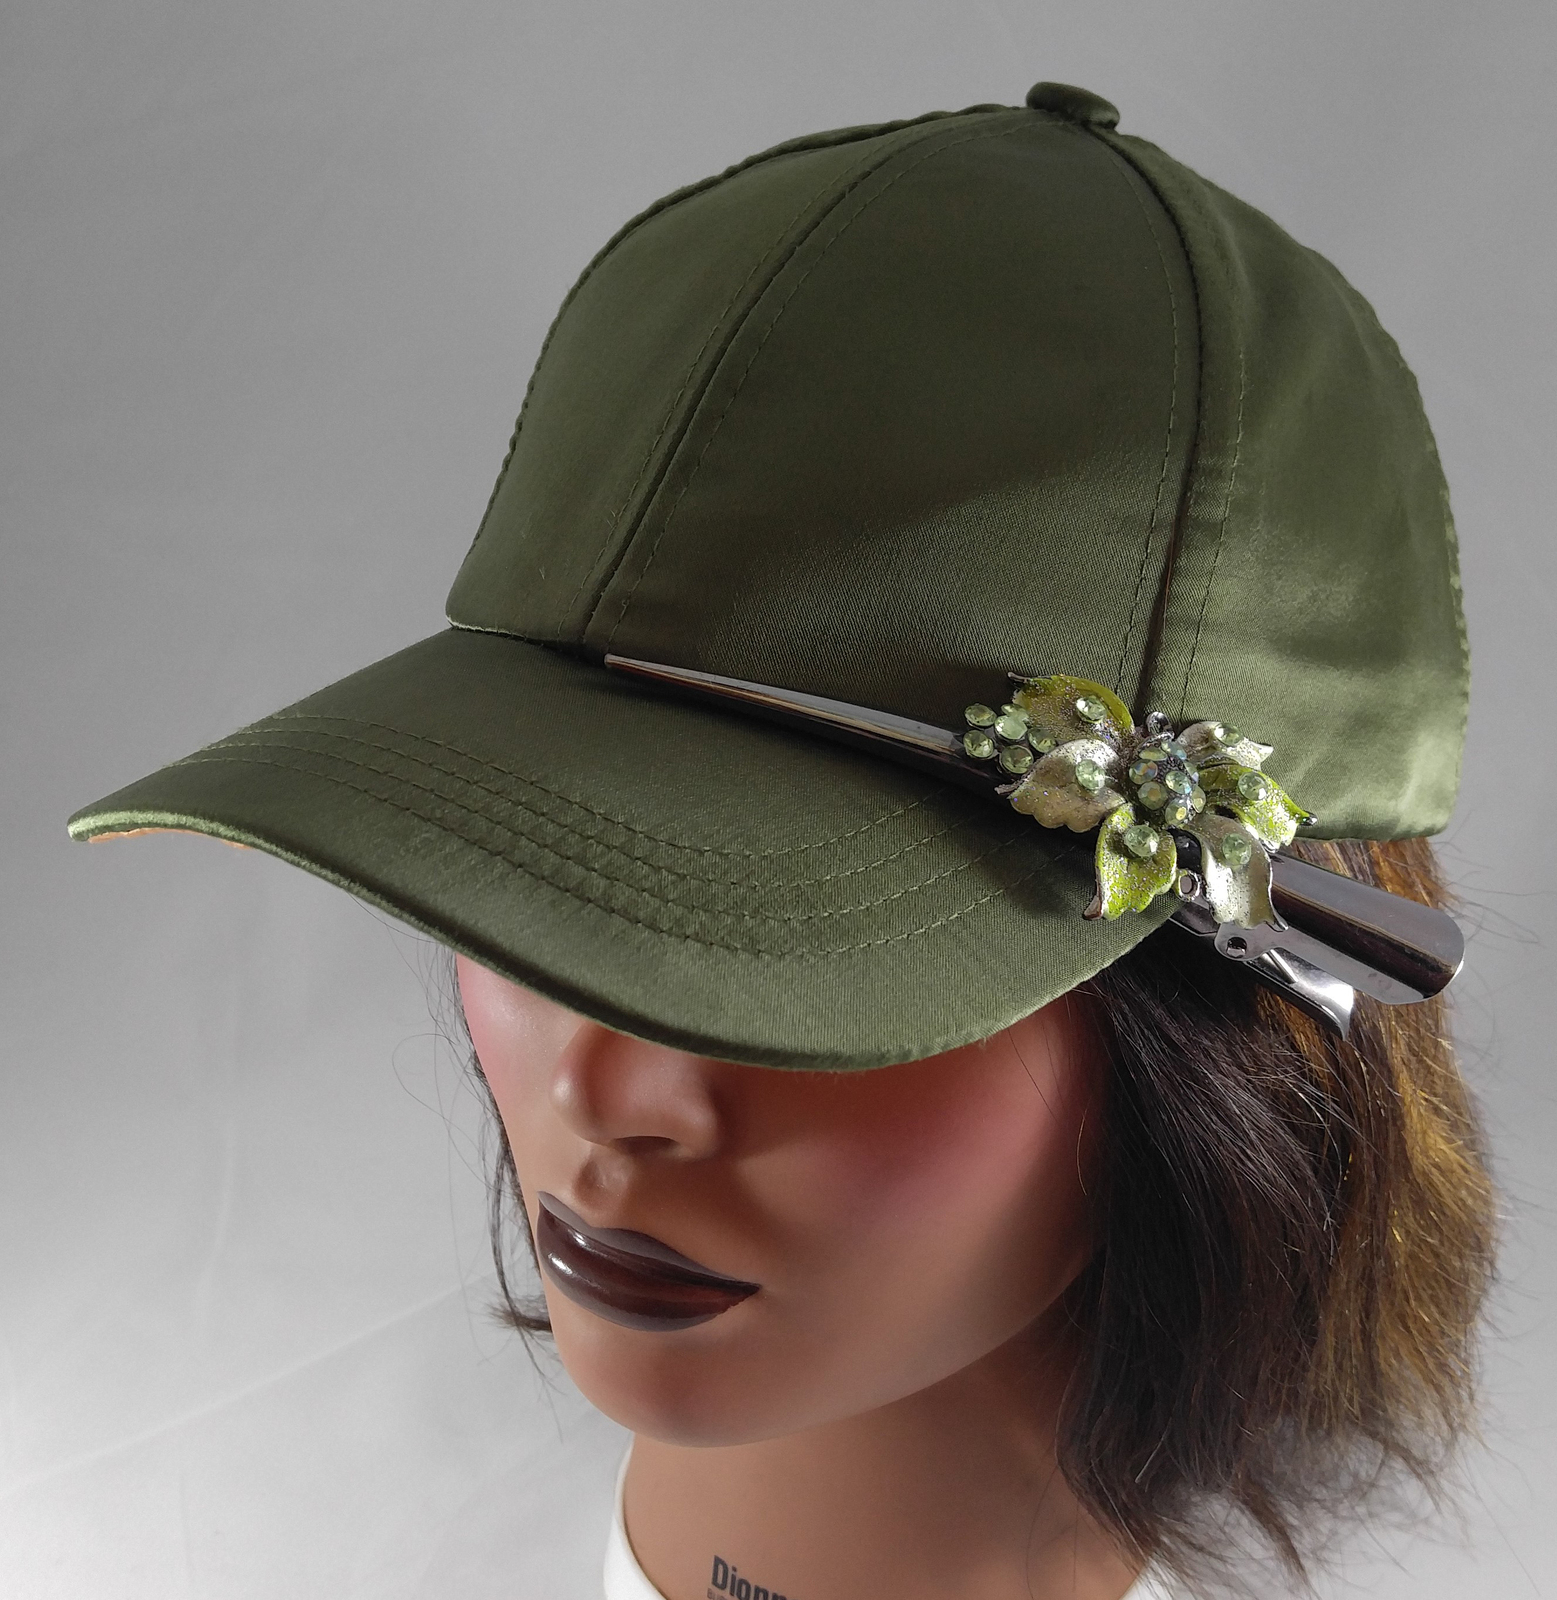 e3bcb9aedc0 Woman s Green Baseball Cap w Gunmetal Grey and 50 similar items